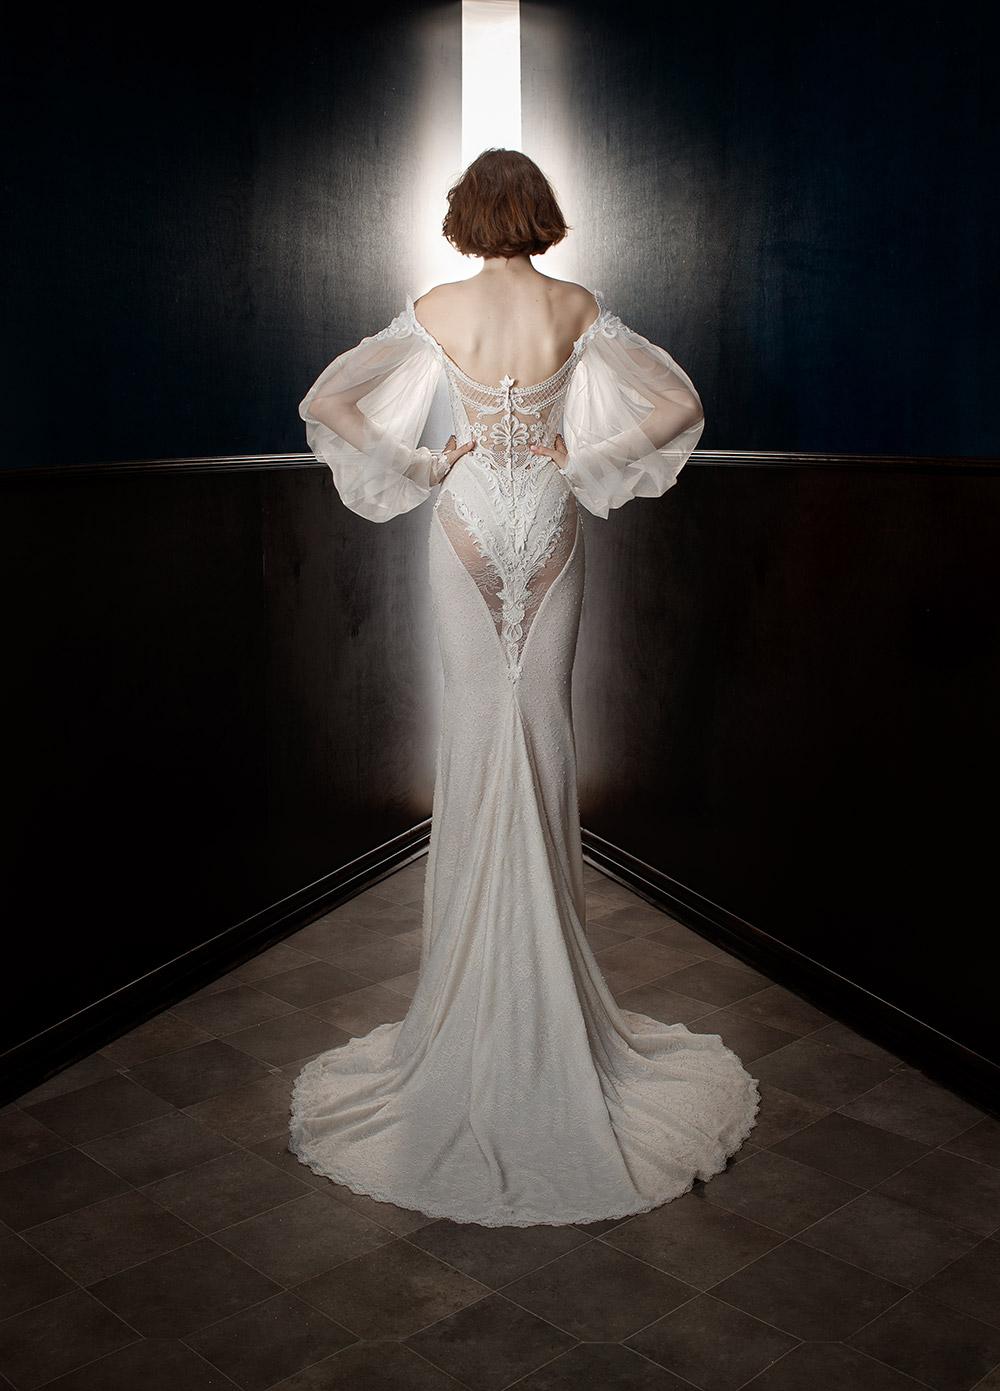 Thelma - Galia Lahav Spring 2018 Bridal Collection. www.theweddingnotebook.com